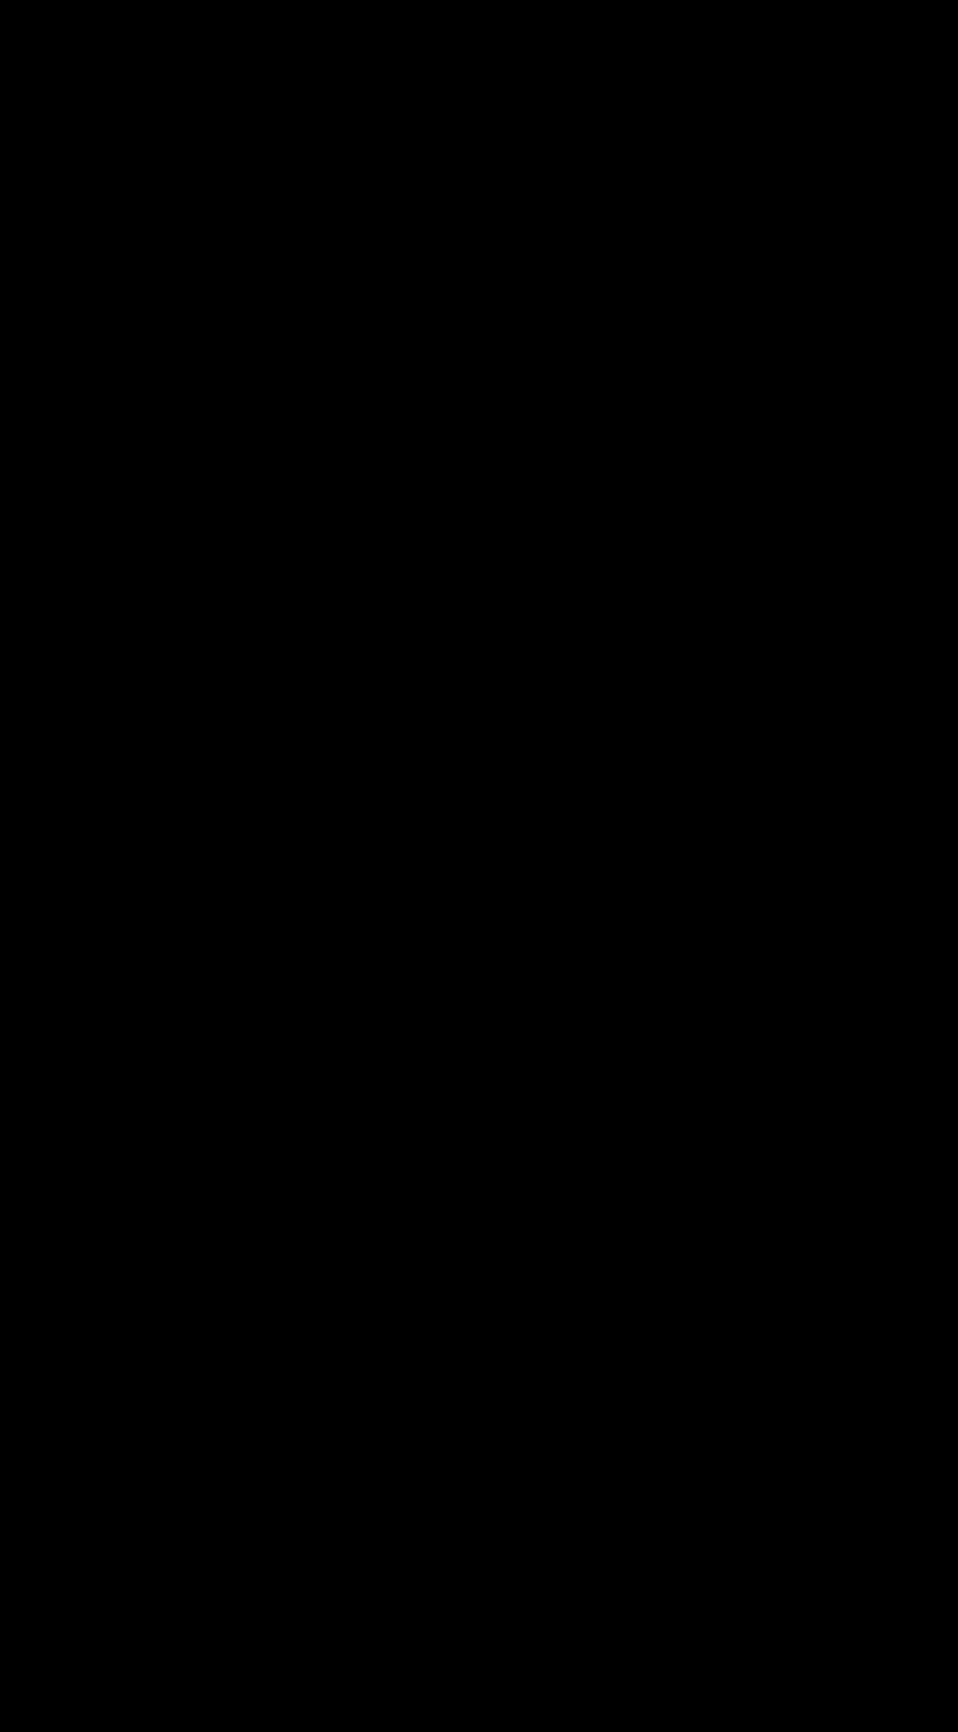 Public domain clip art. Weight clipart silhouette